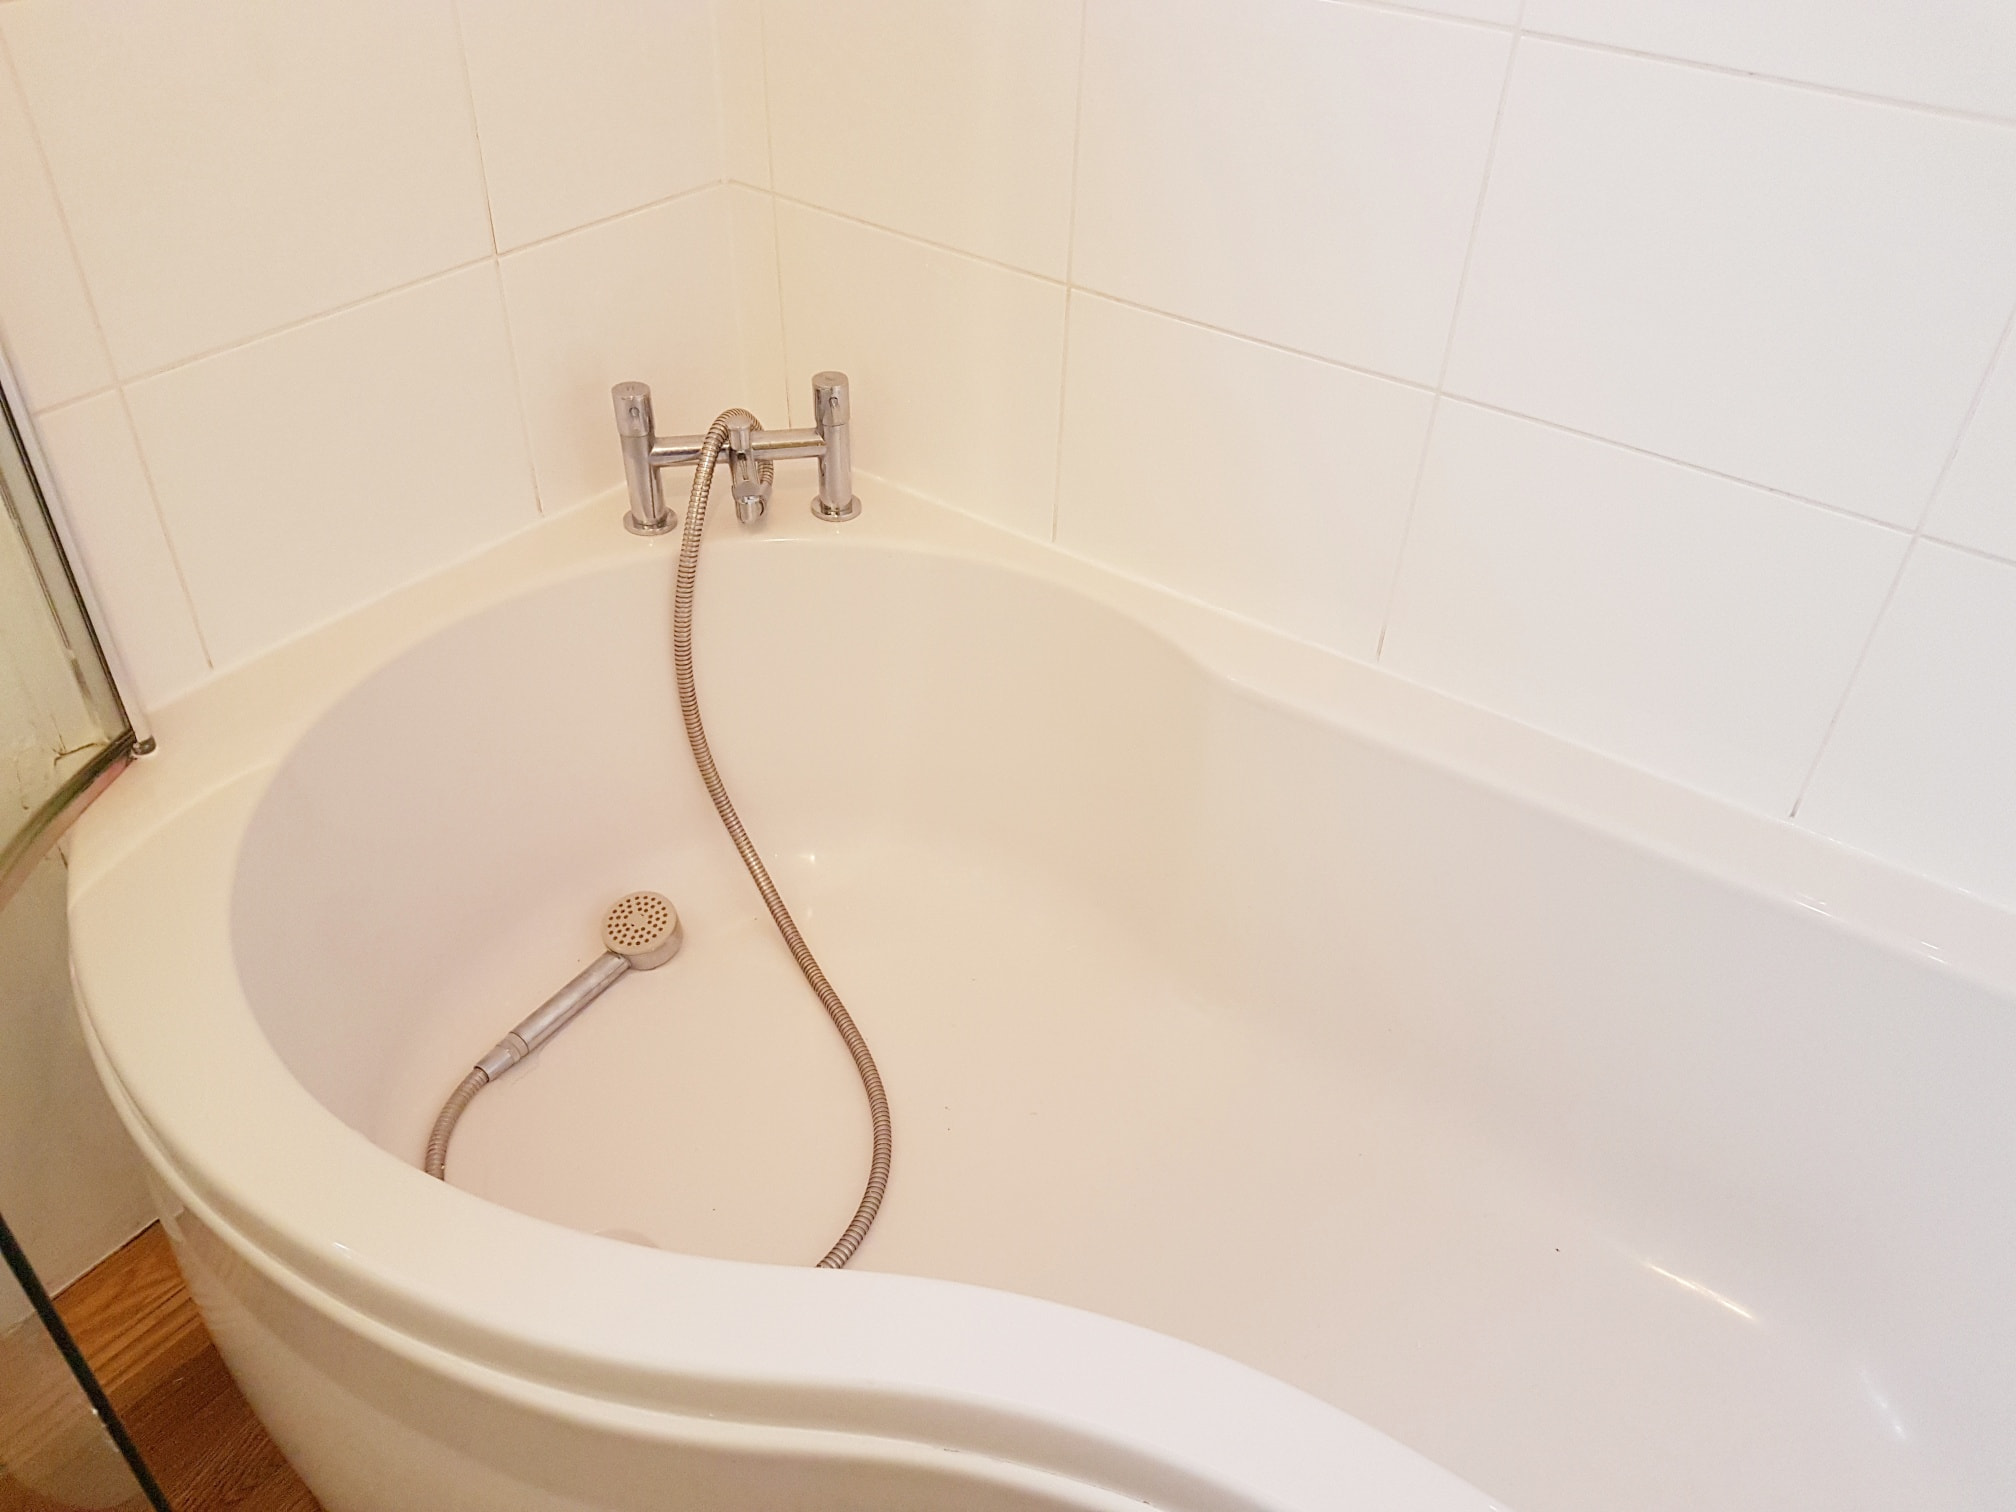 Renovating White Ceramic Tiled Bathroom Harrogate After